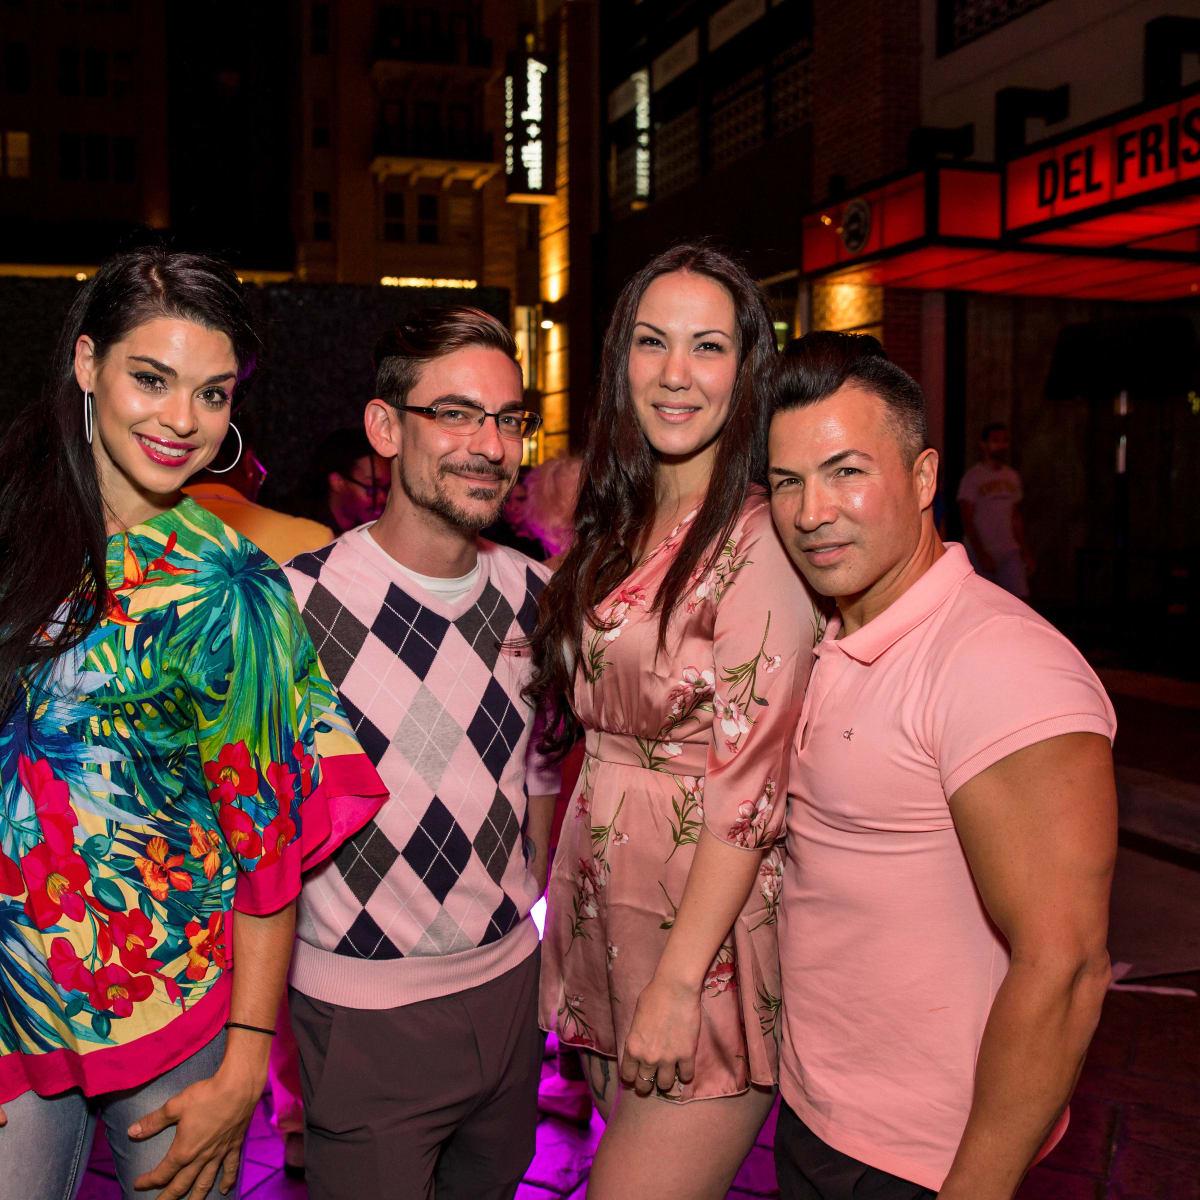 Houston, Marcy, West Ave Pink Party, October 2017, Shana Hand, Kaleb Duhon, Crys Williams, Randall Valentino Gonzalez